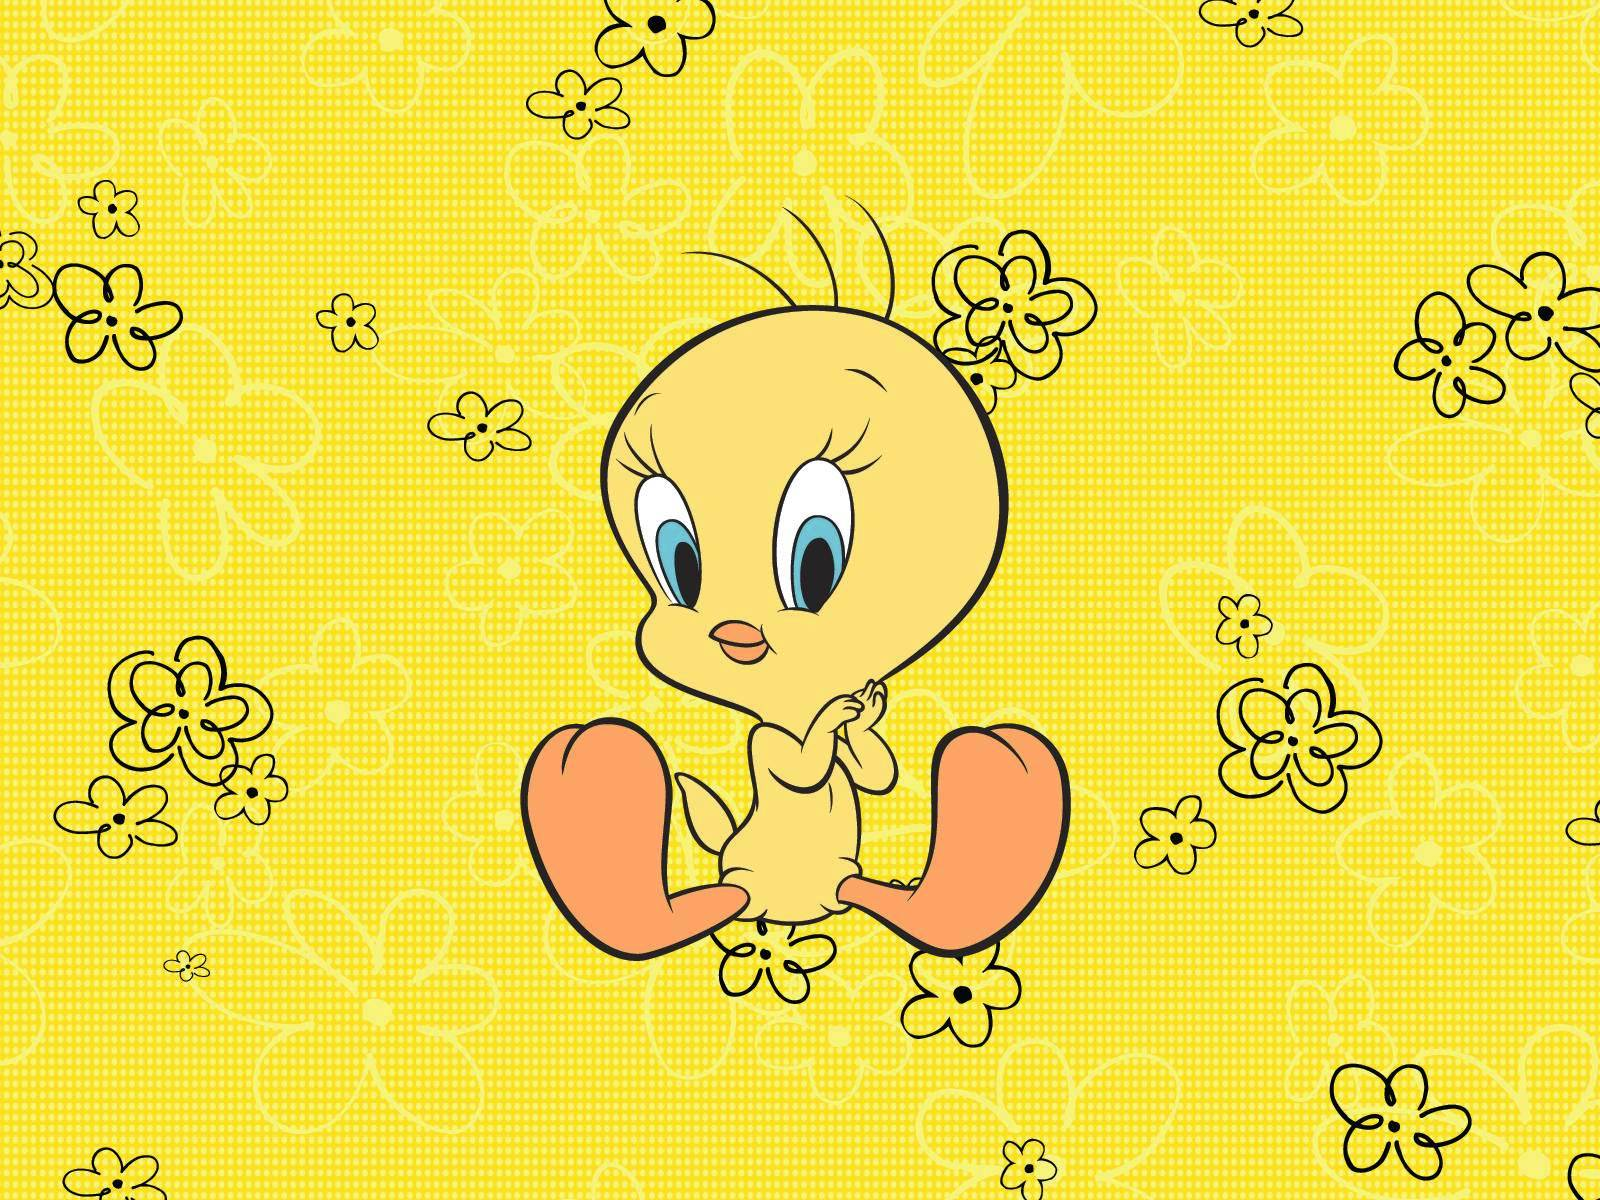 Baby tweety bird wallpaper